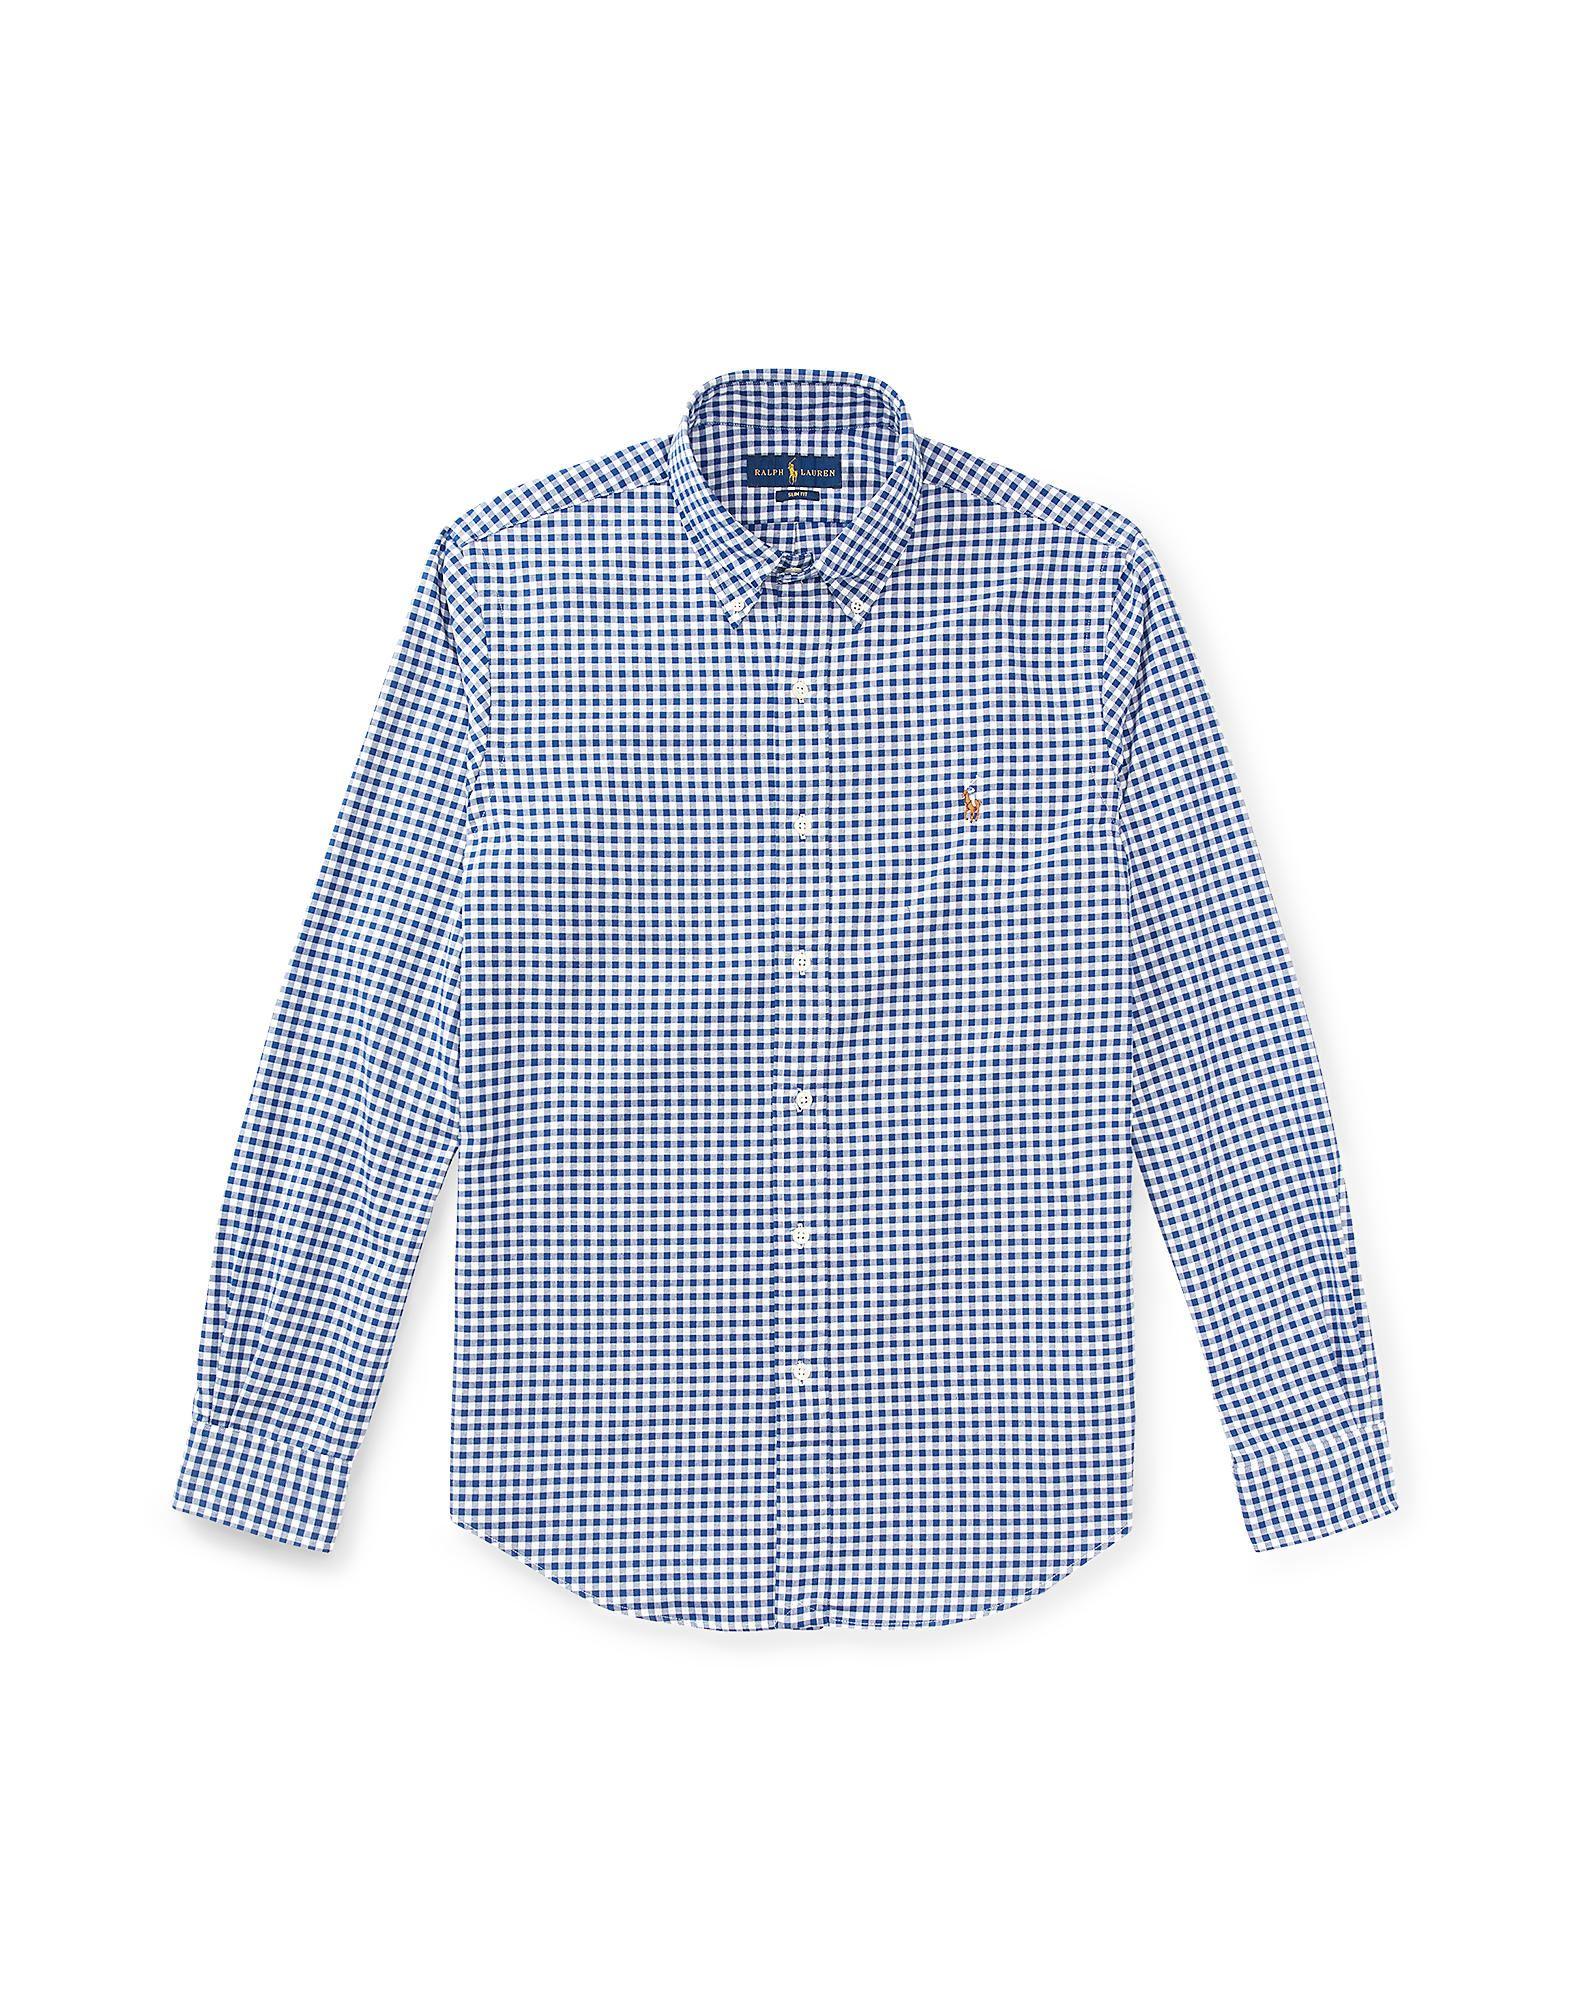 385f9634d247 Καρό Πουκάμισο Polo Ralph Lauren Slim Plaid Cotton Poplin Shirt - Άνδρας -  Καρό Πουκάμισα Polo Ralph Lauren στο YOOX - 38628905CW